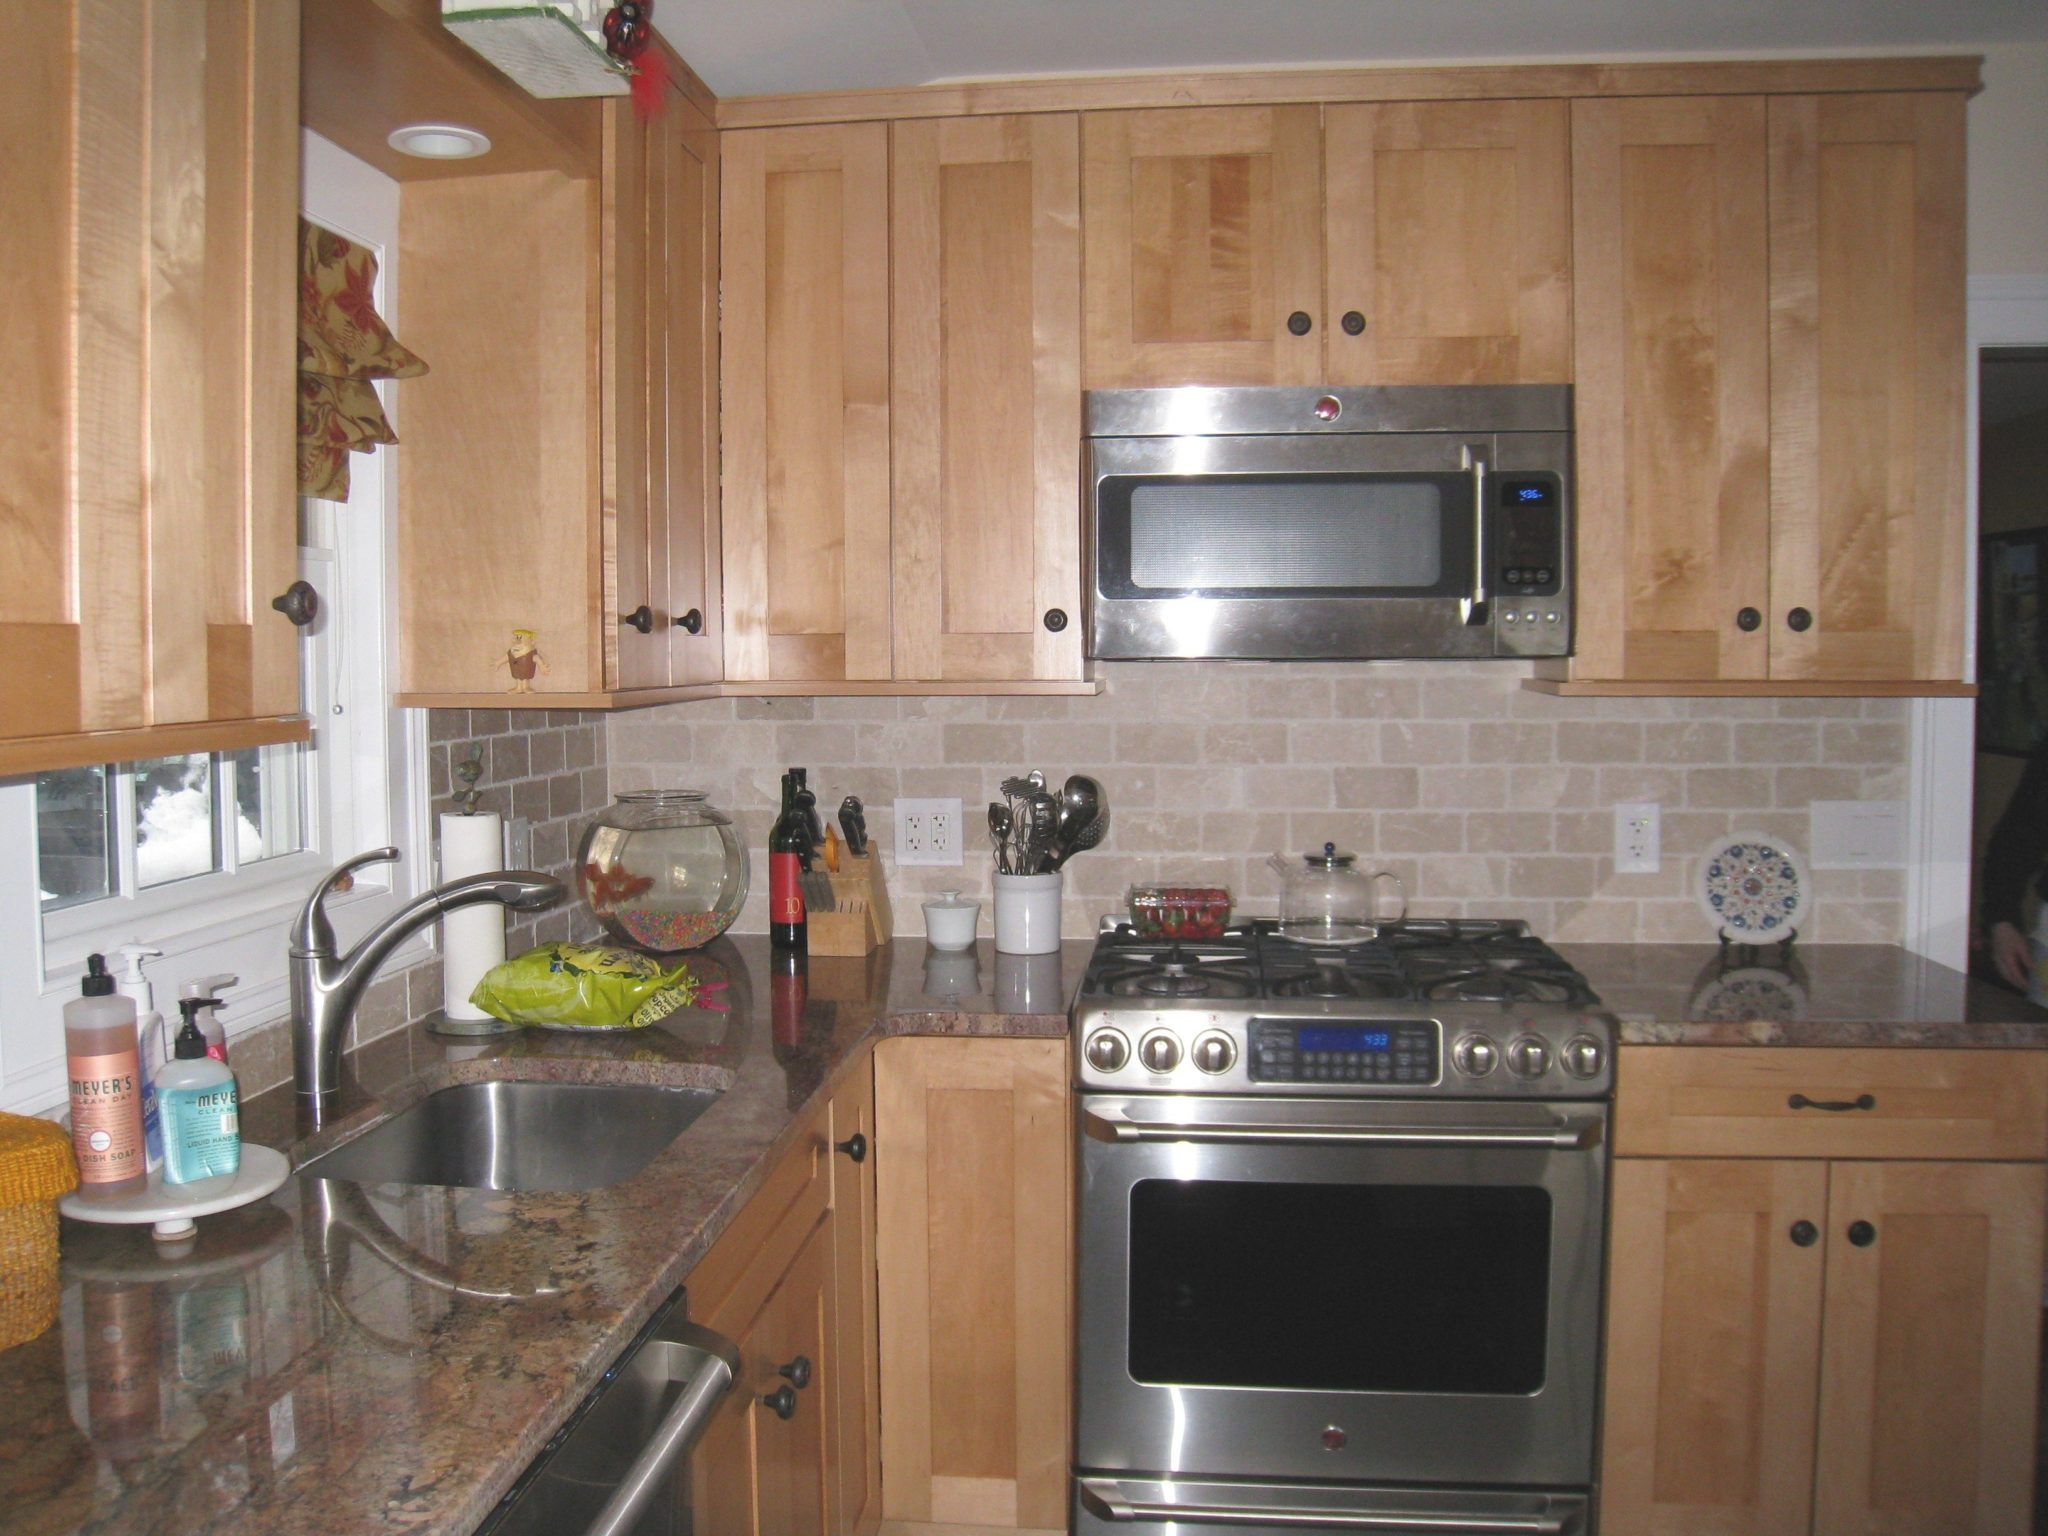 Stove Cabinet Ideas Google Search Kitchen Ideas Pinterest Inside Maple Kitchen Cabinets Kitchen Cabinets And Backsplash Backsplash Kitchen White Cabinets